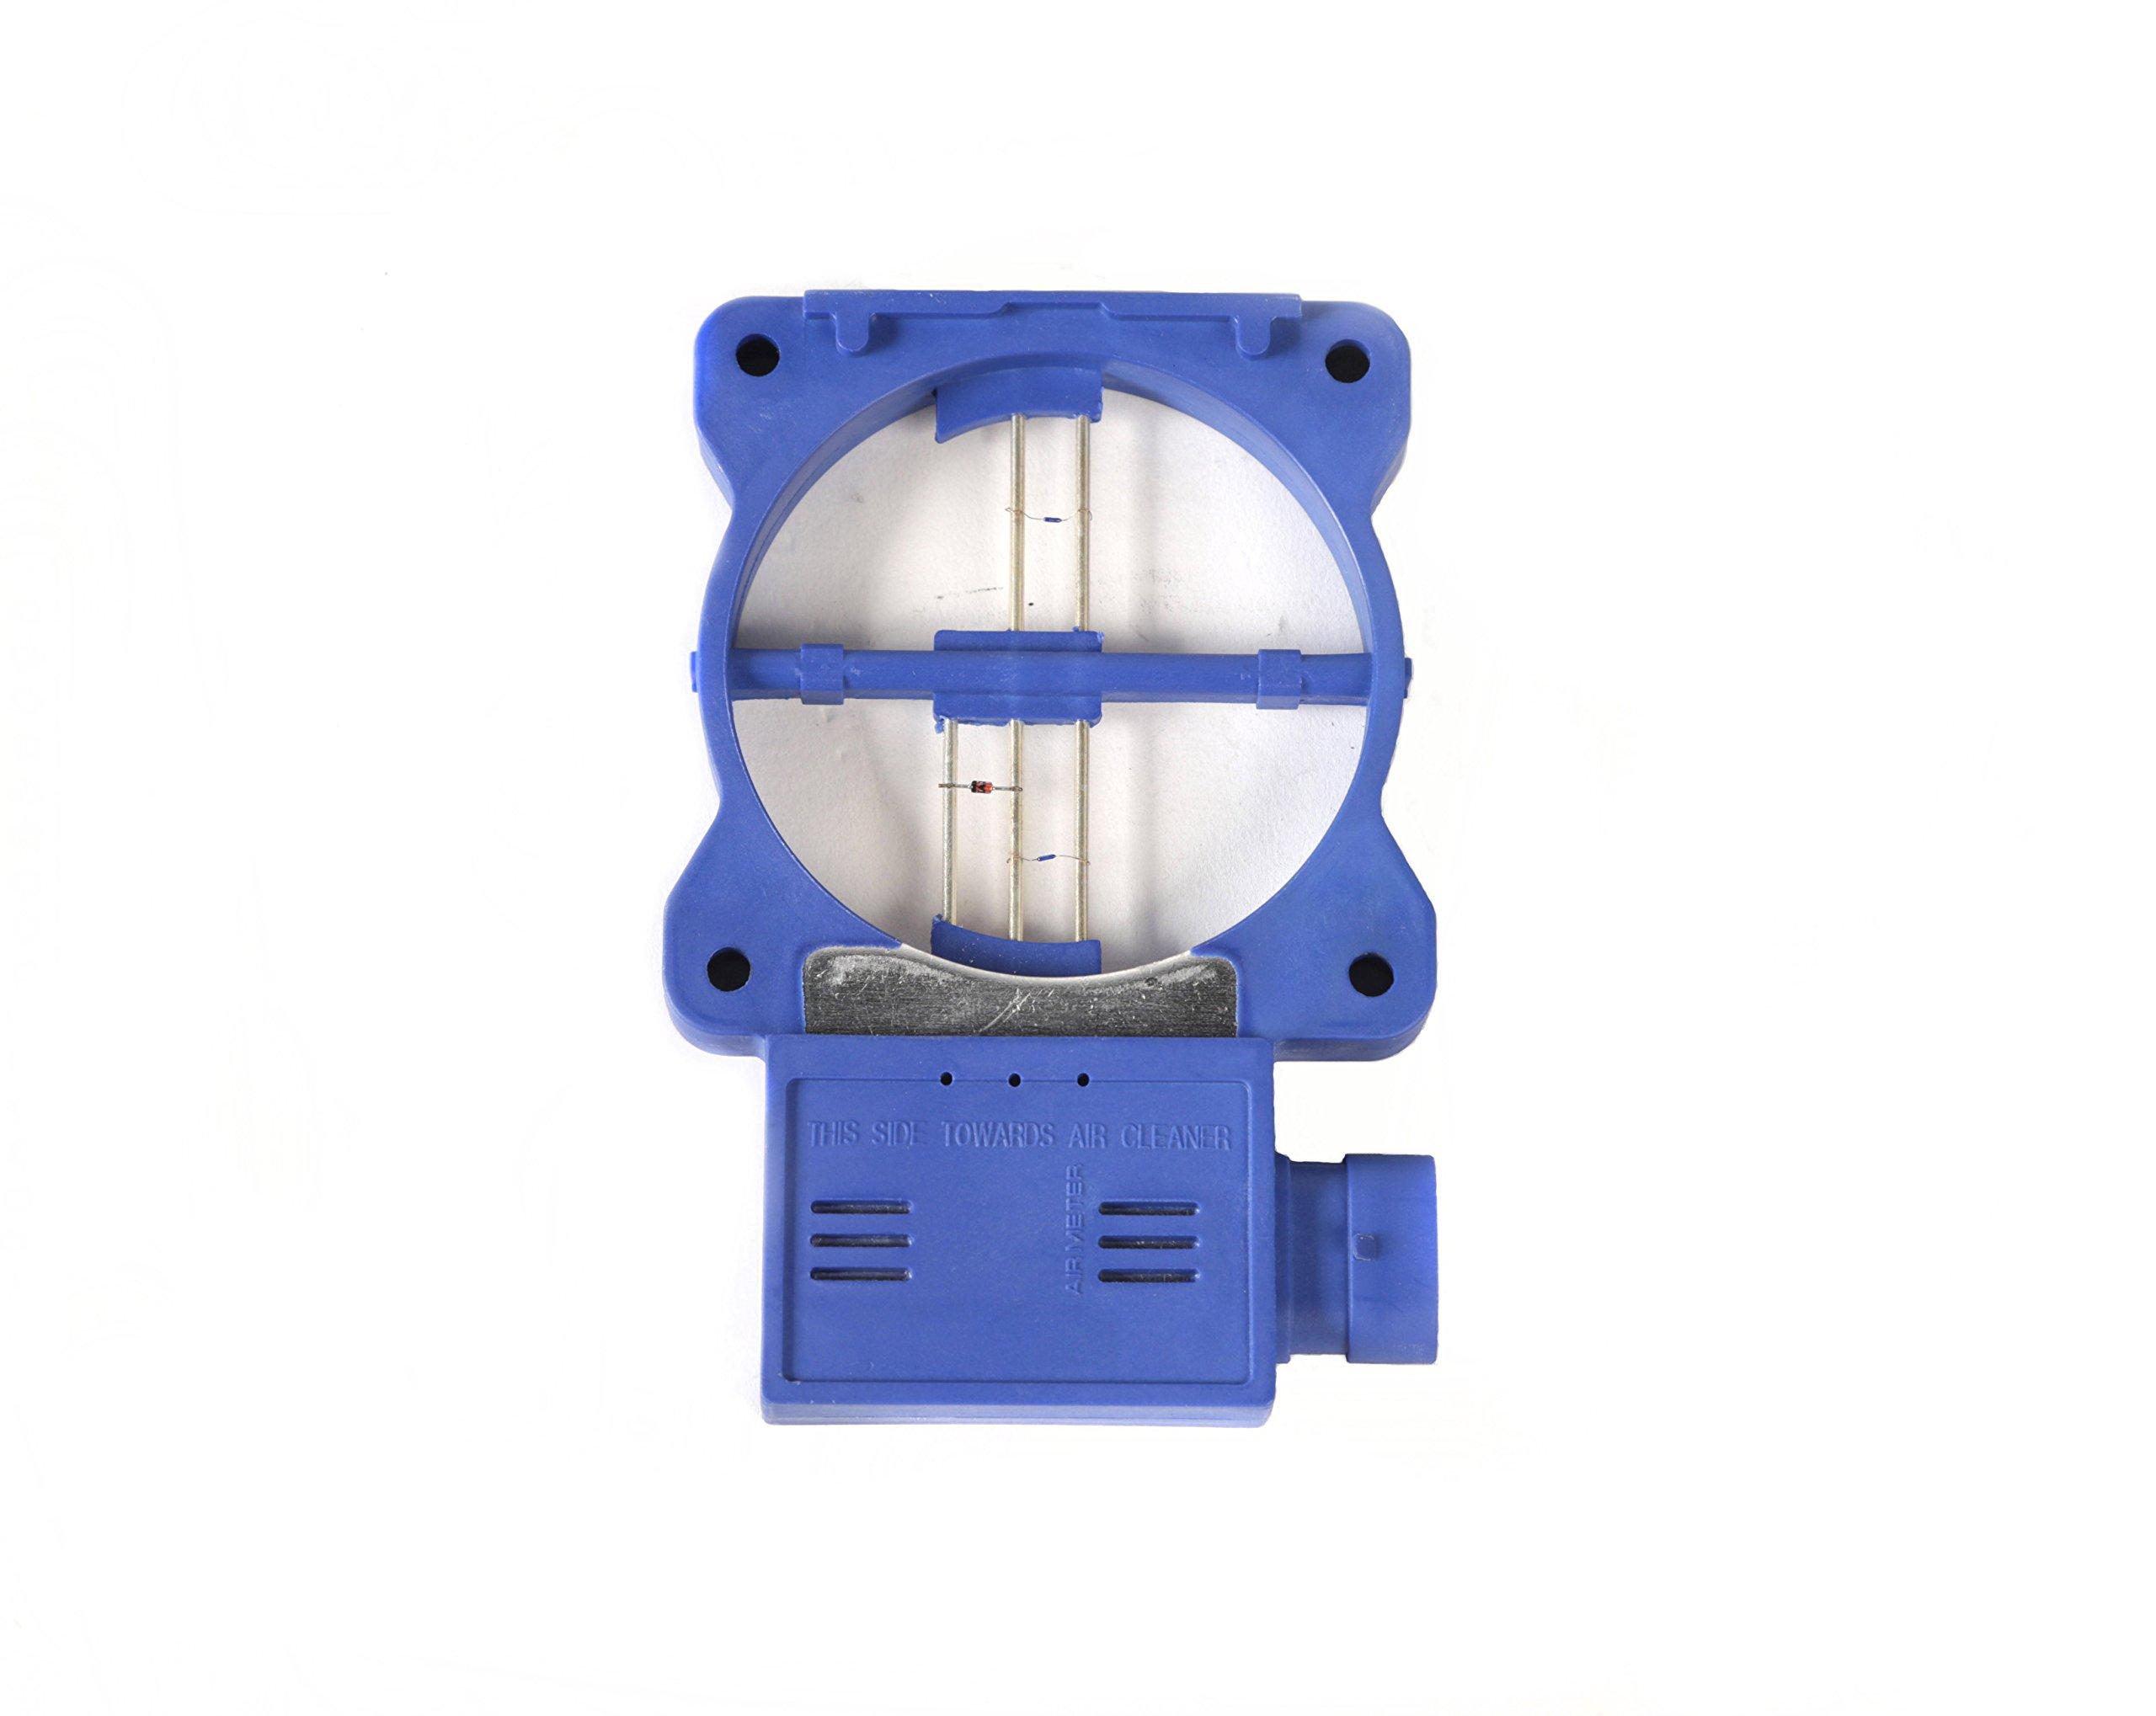 Mr. Sensor Mass Air Flow Meter Sensor for 96-02 Chevrolet Express 1500 4.3L V6 & 96-99 GMC C2500 Suburban 5.7L V8